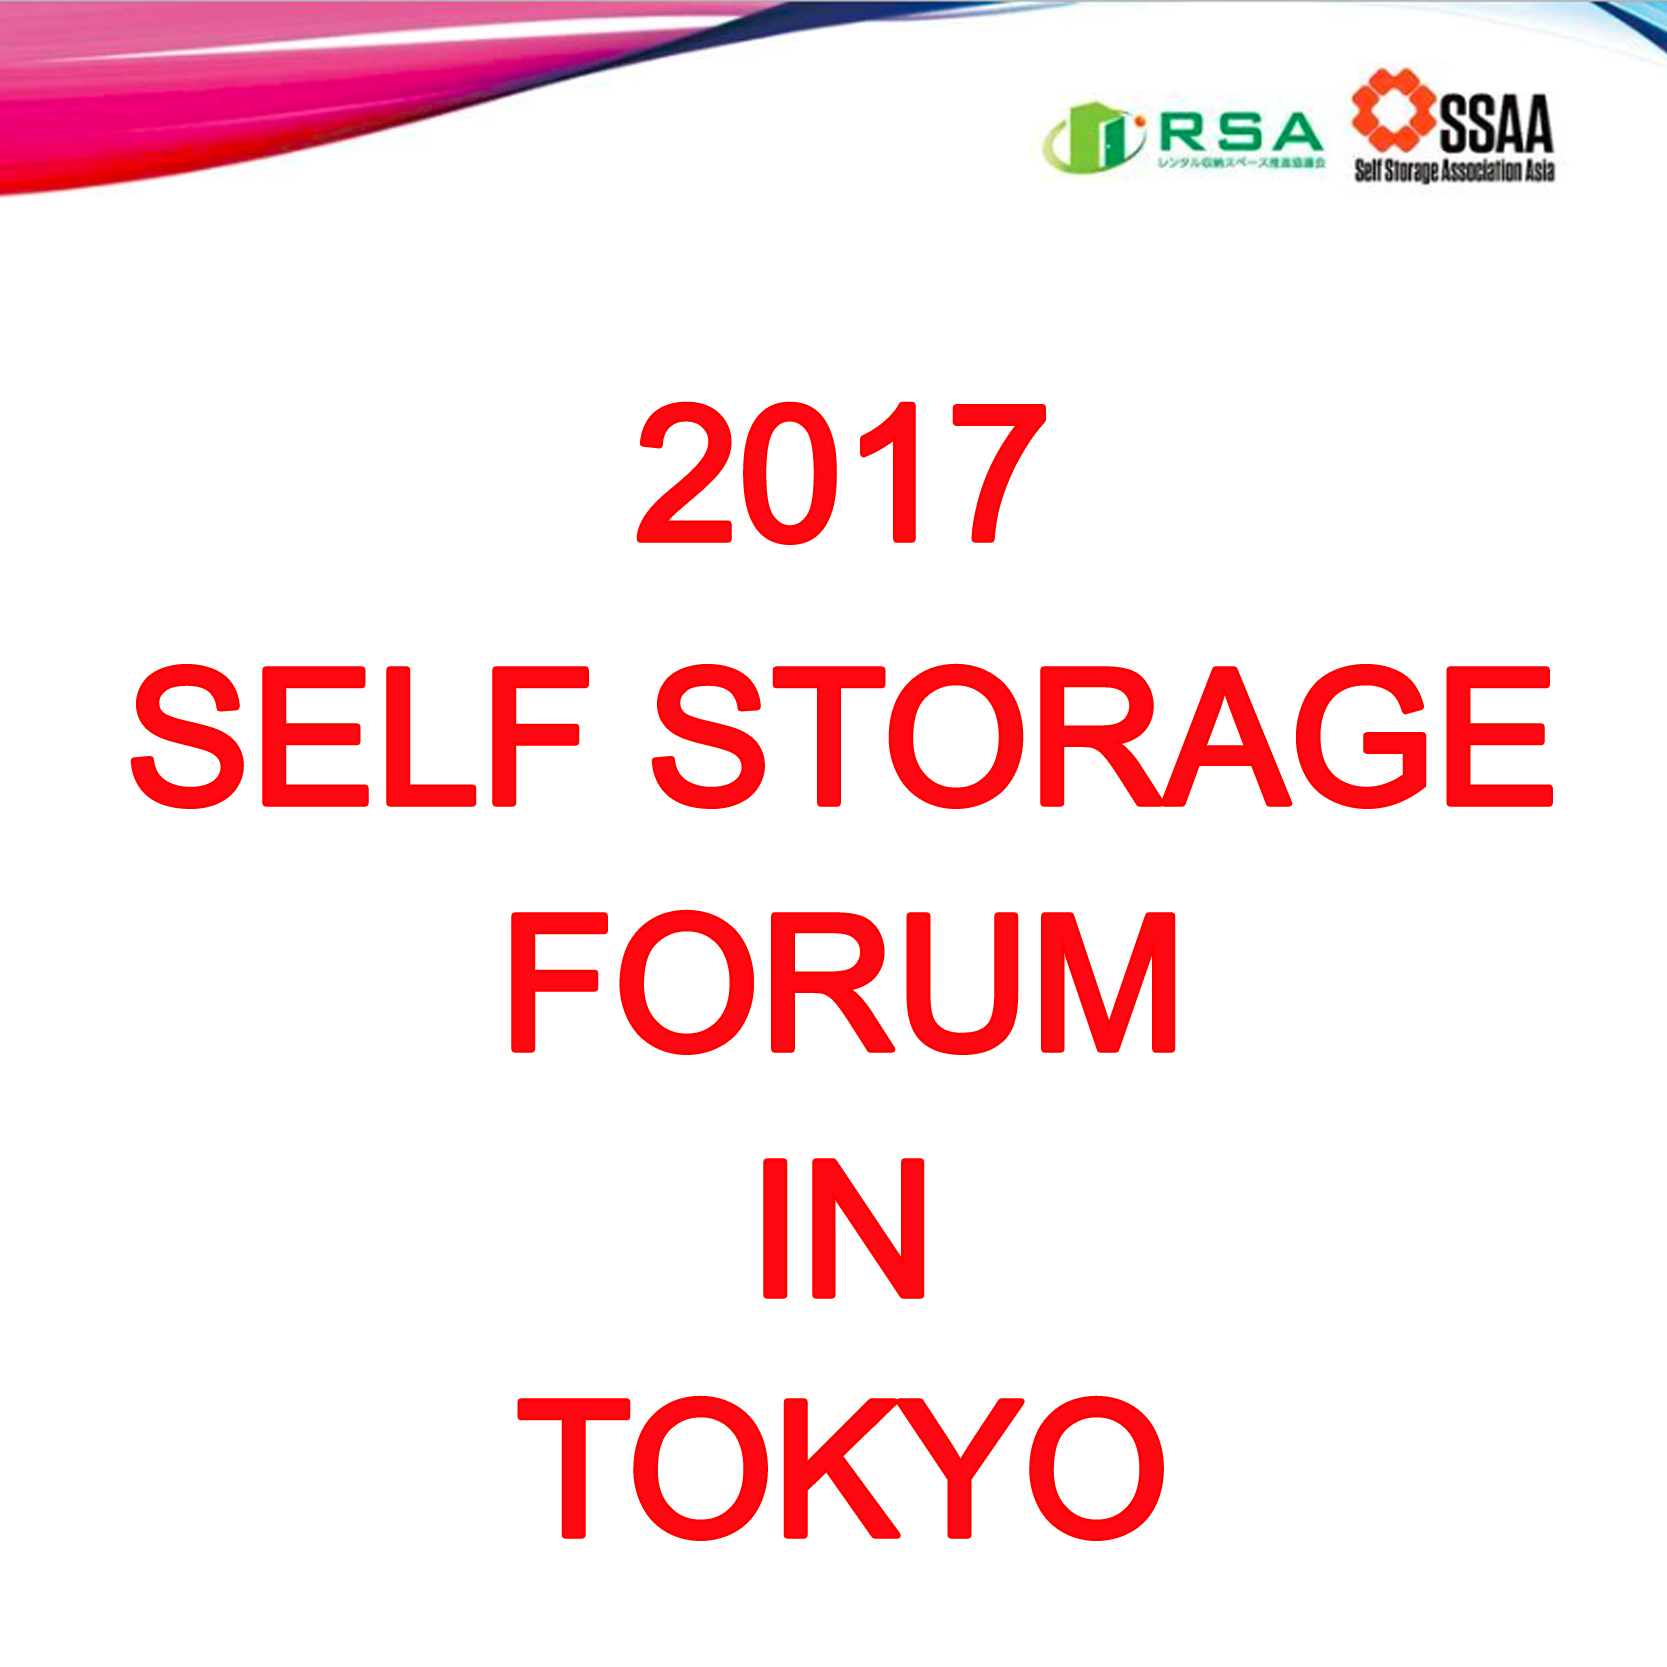 Nov 21-22 - 2017 Self Storage Forum in Tokyo